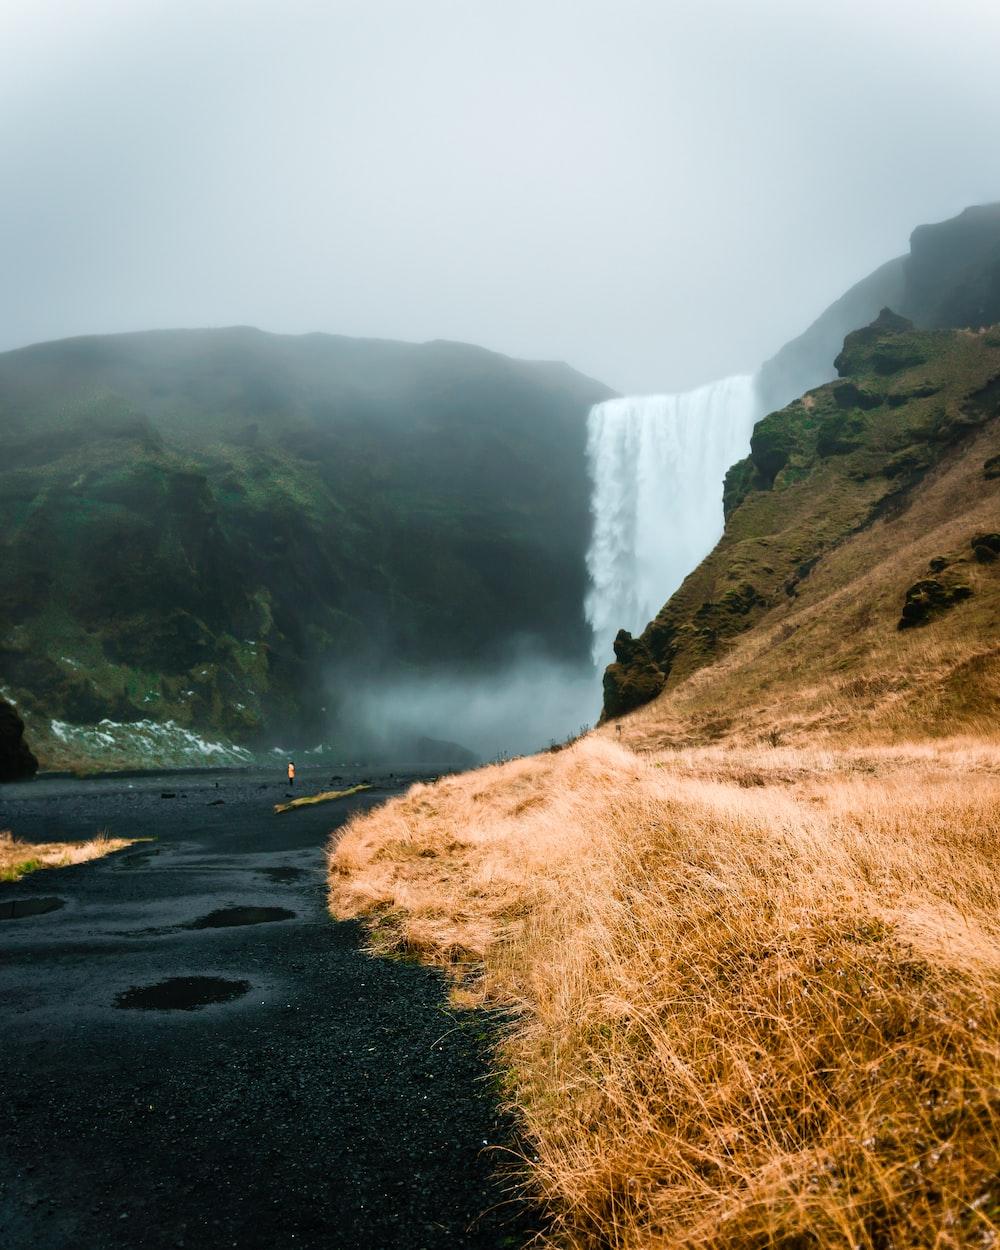 waterfalls close-up photography